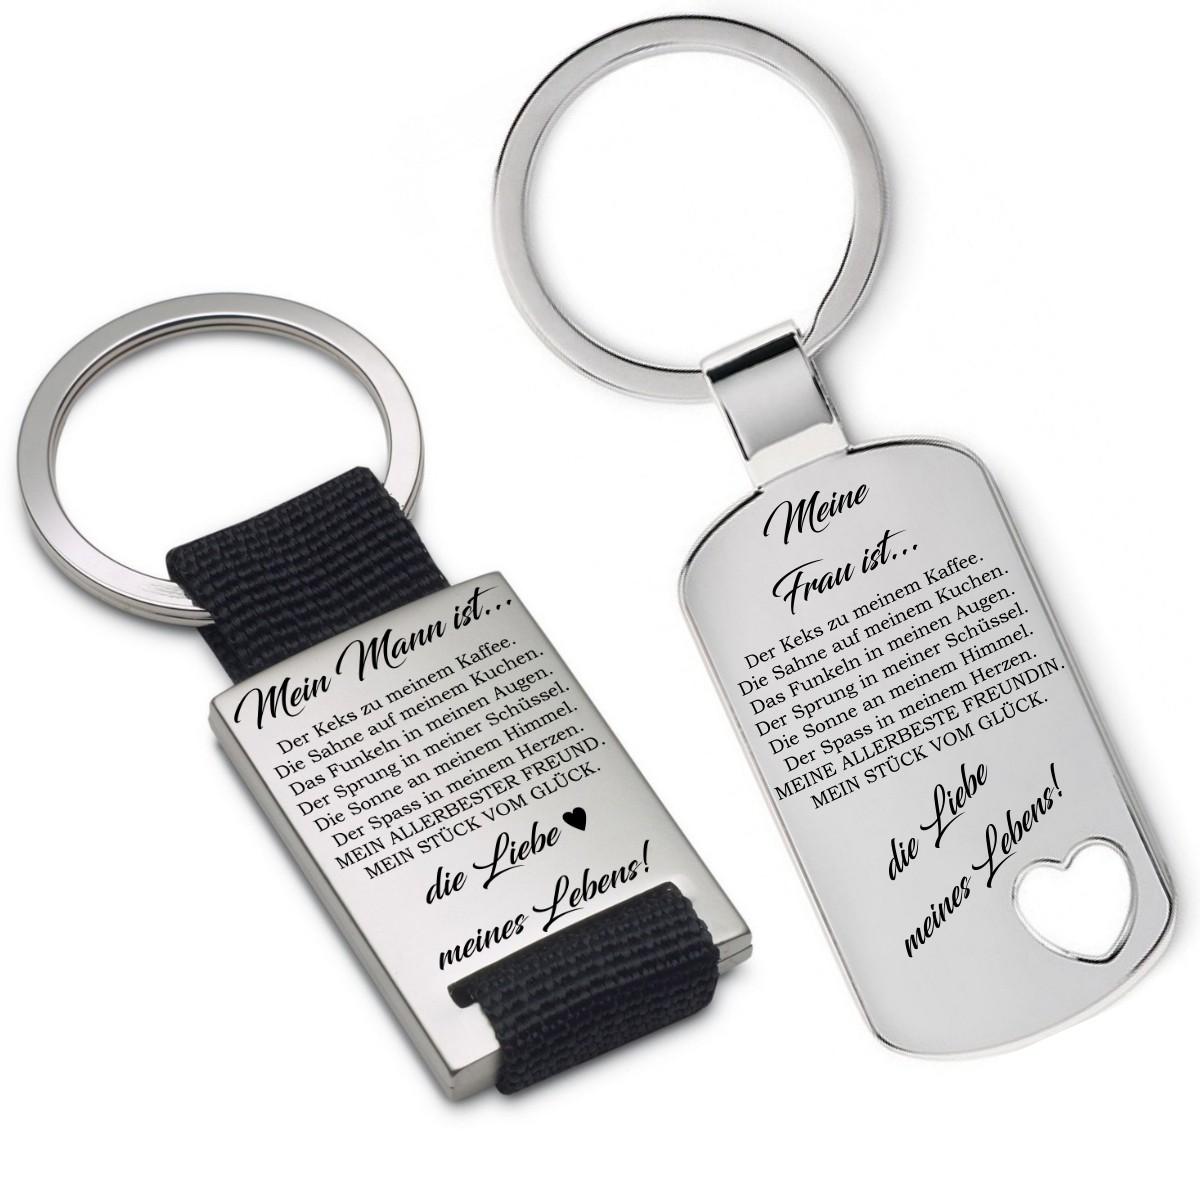 Schlüsselanhänger: Mein(e) Frau/Mann/Freundin/Freund ist...